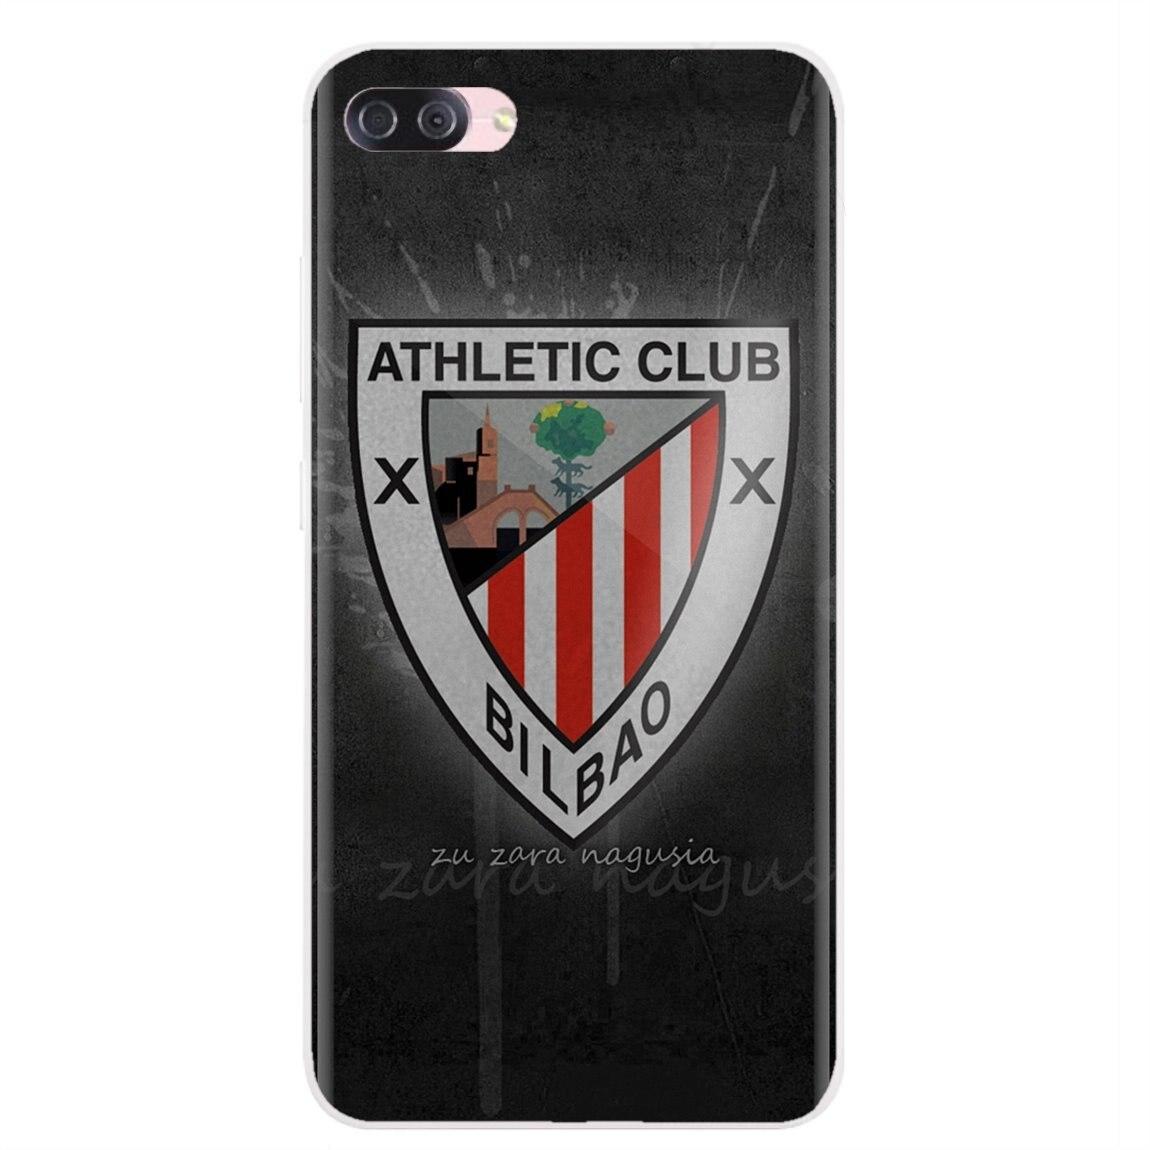 Logotipo del Club Atlético para Huawei G7 G8 P7 P8 P9 P10 P20 P30 Lite Mini Pro P Smart 2017 2018 2019 vender funda de silicona para teléfono